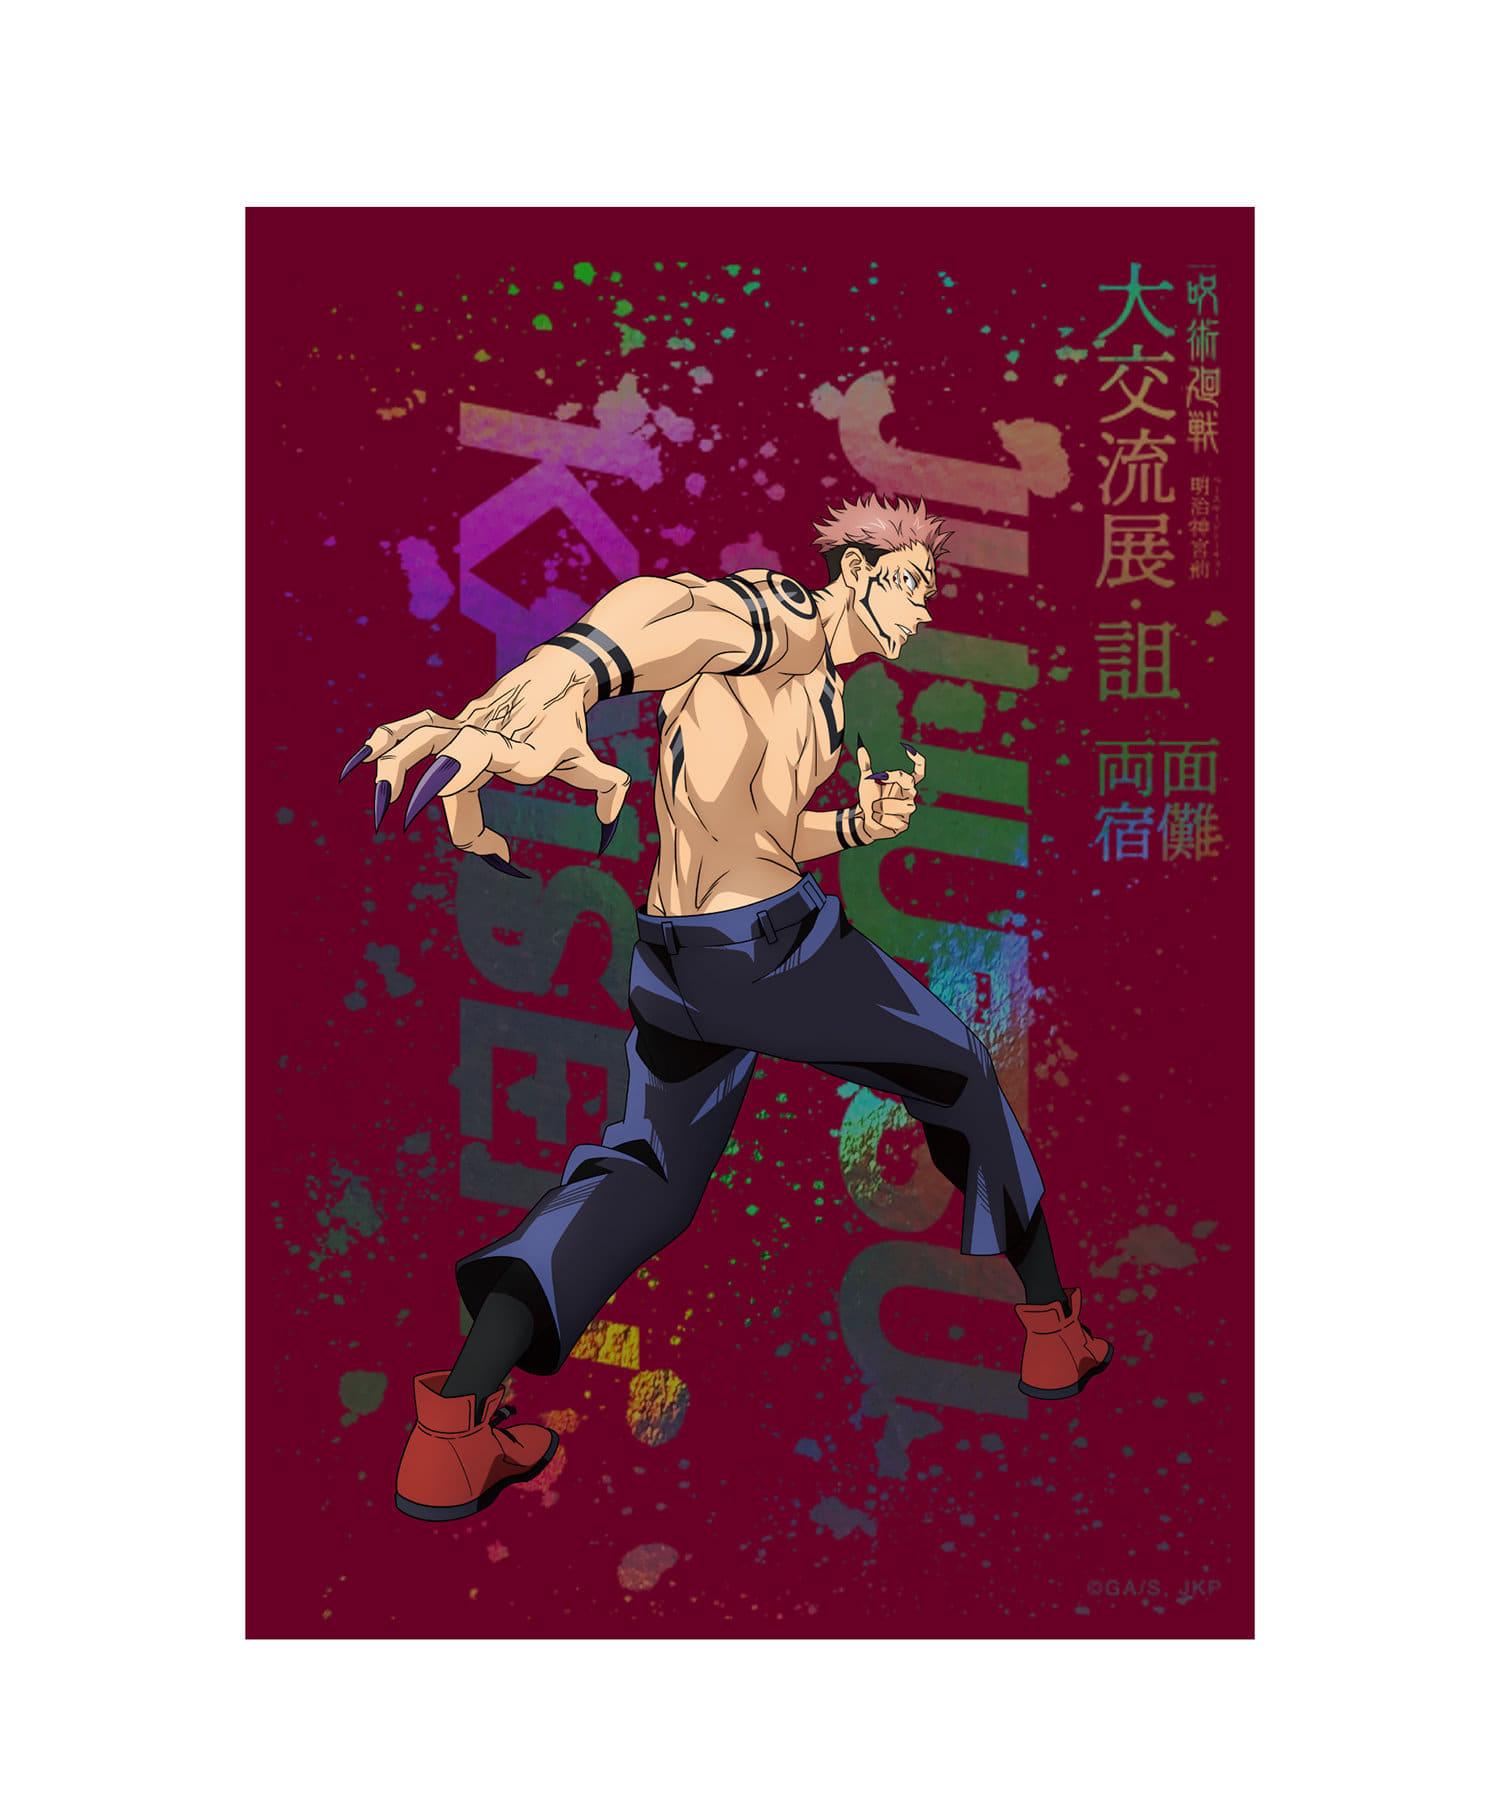 baseyard tokyo(ベースヤード トーキョー) 【呪術廻戦『明治神宮前大交流展・詛』限定グッズ】両面宿儺ビッグブロマイド